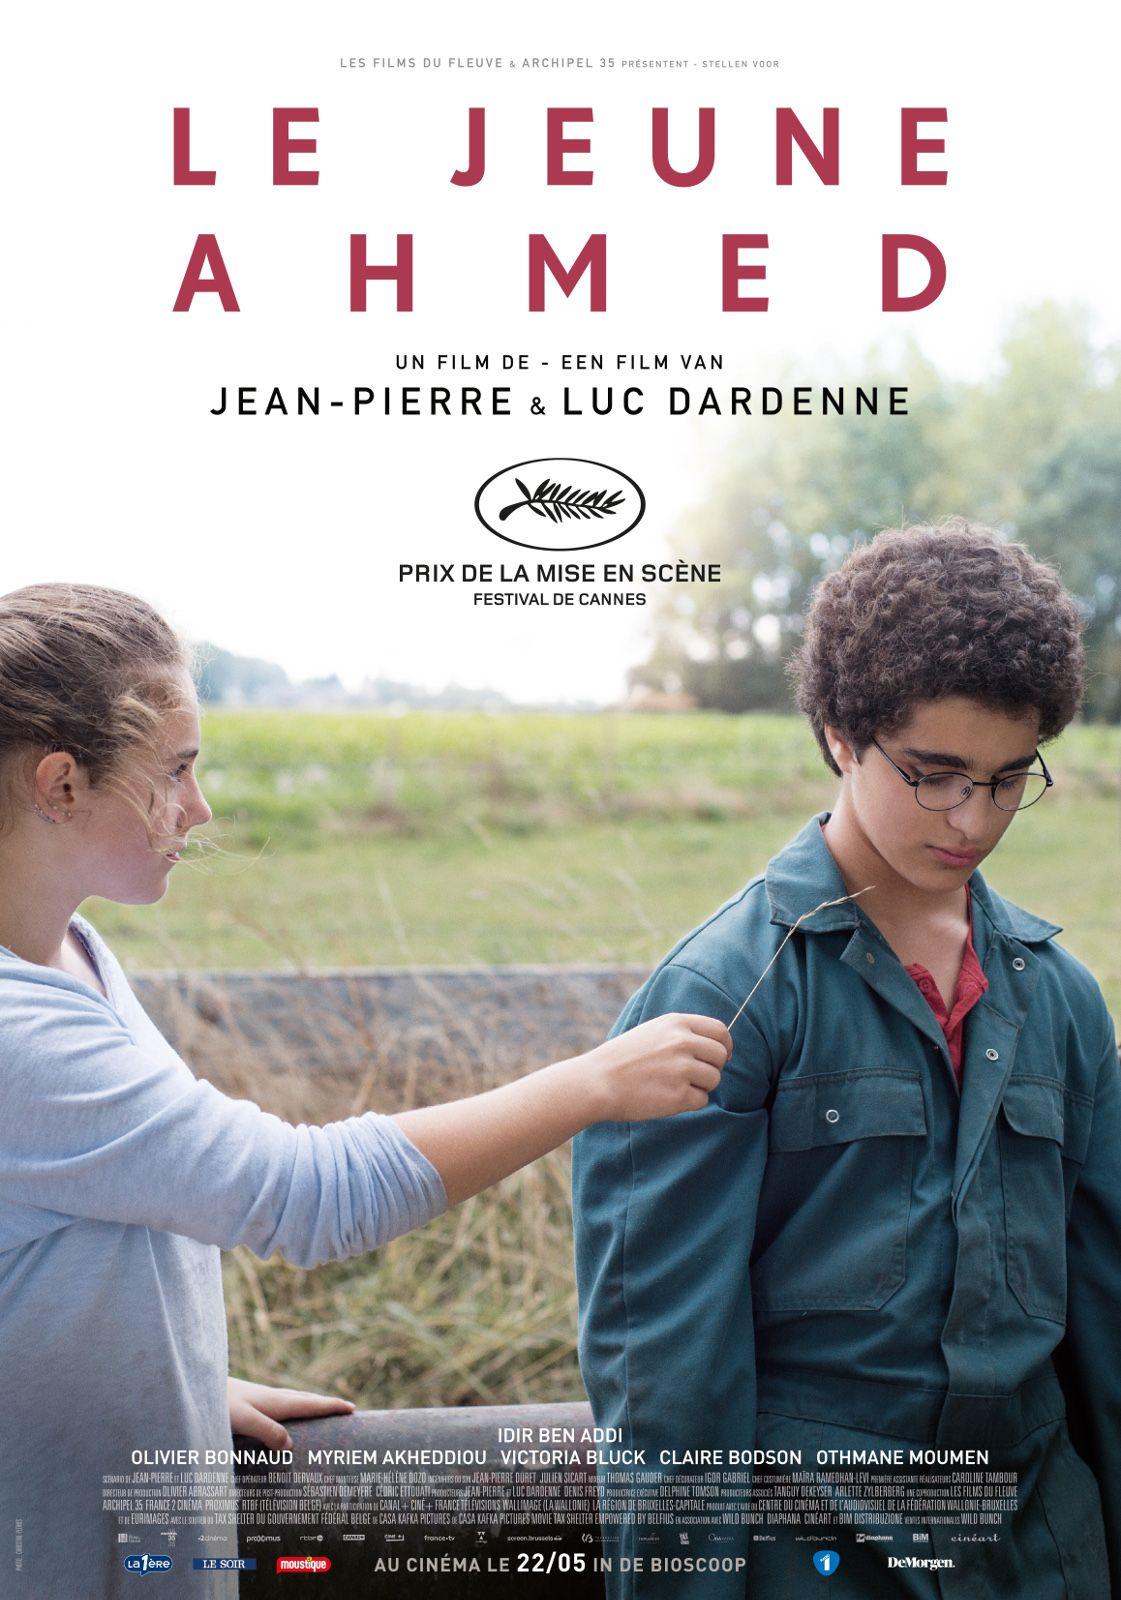 Young Ahmed Le Jeune Ahmed Belgium France Written Directed By Jean Pierre Dardenne Luc Dardenne Produced By Jean Pierre Film Films Online Volledige Films